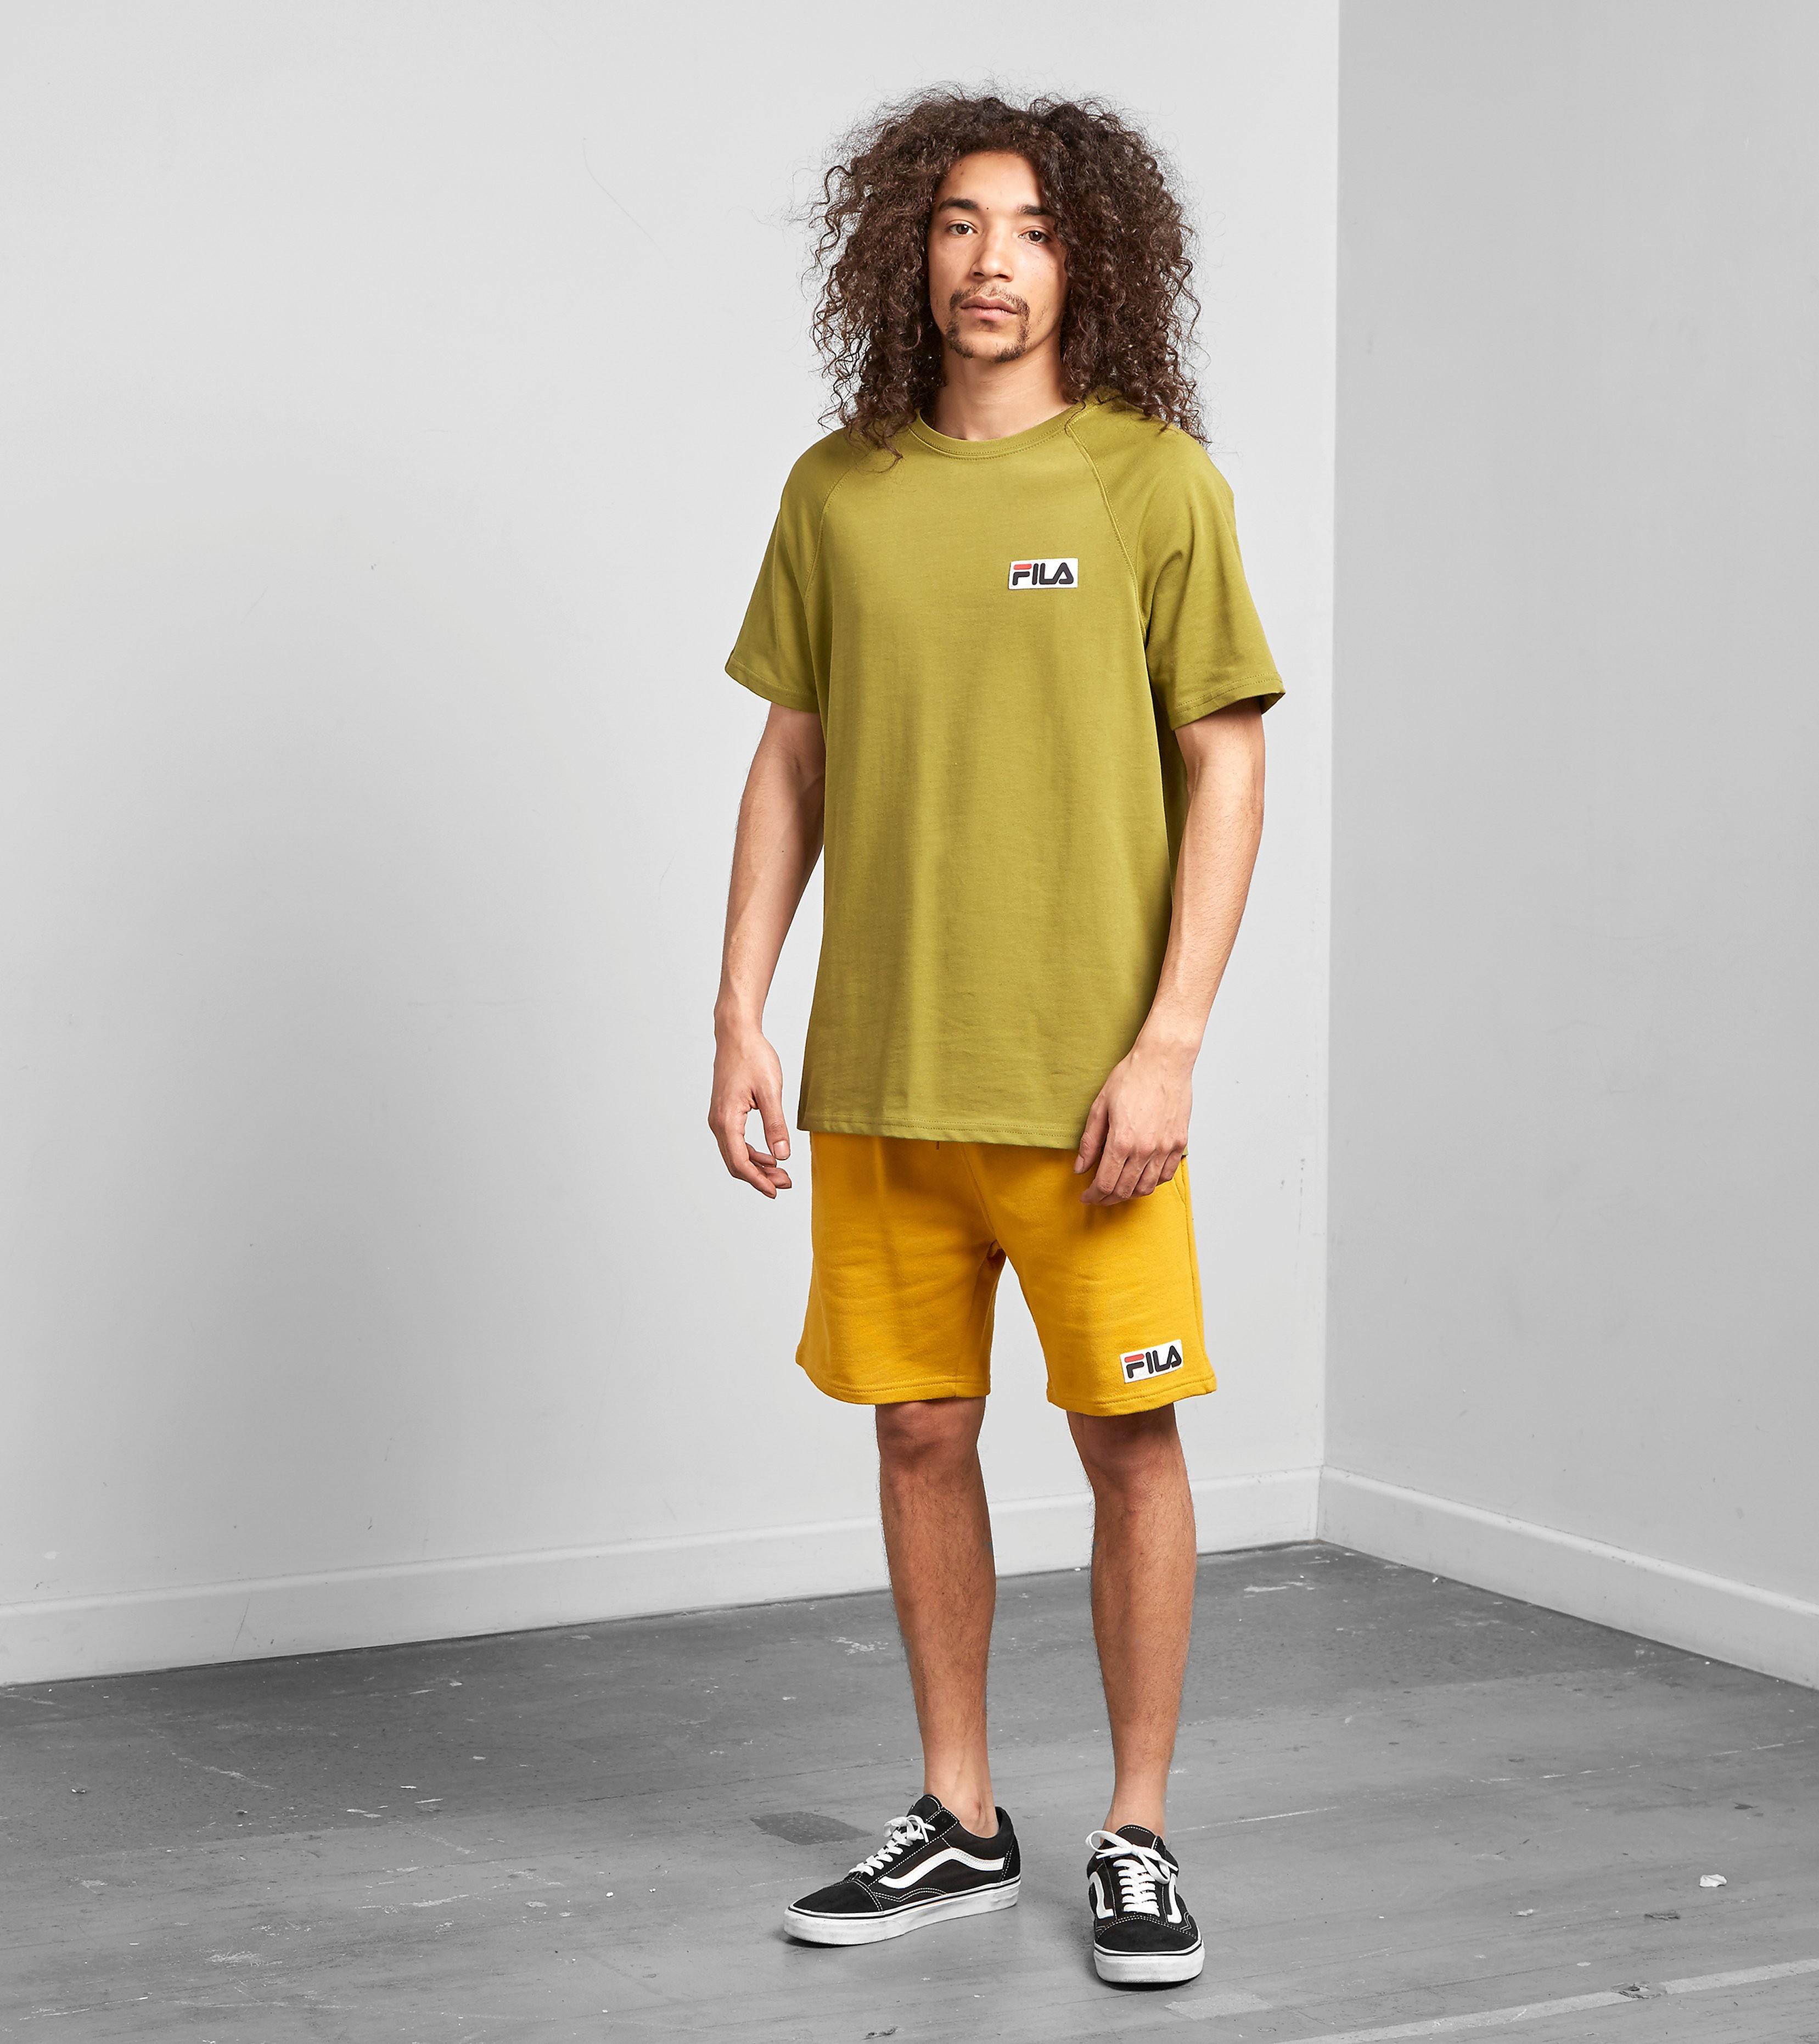 Fila Overhaul T-Shirt - size? Exclusive